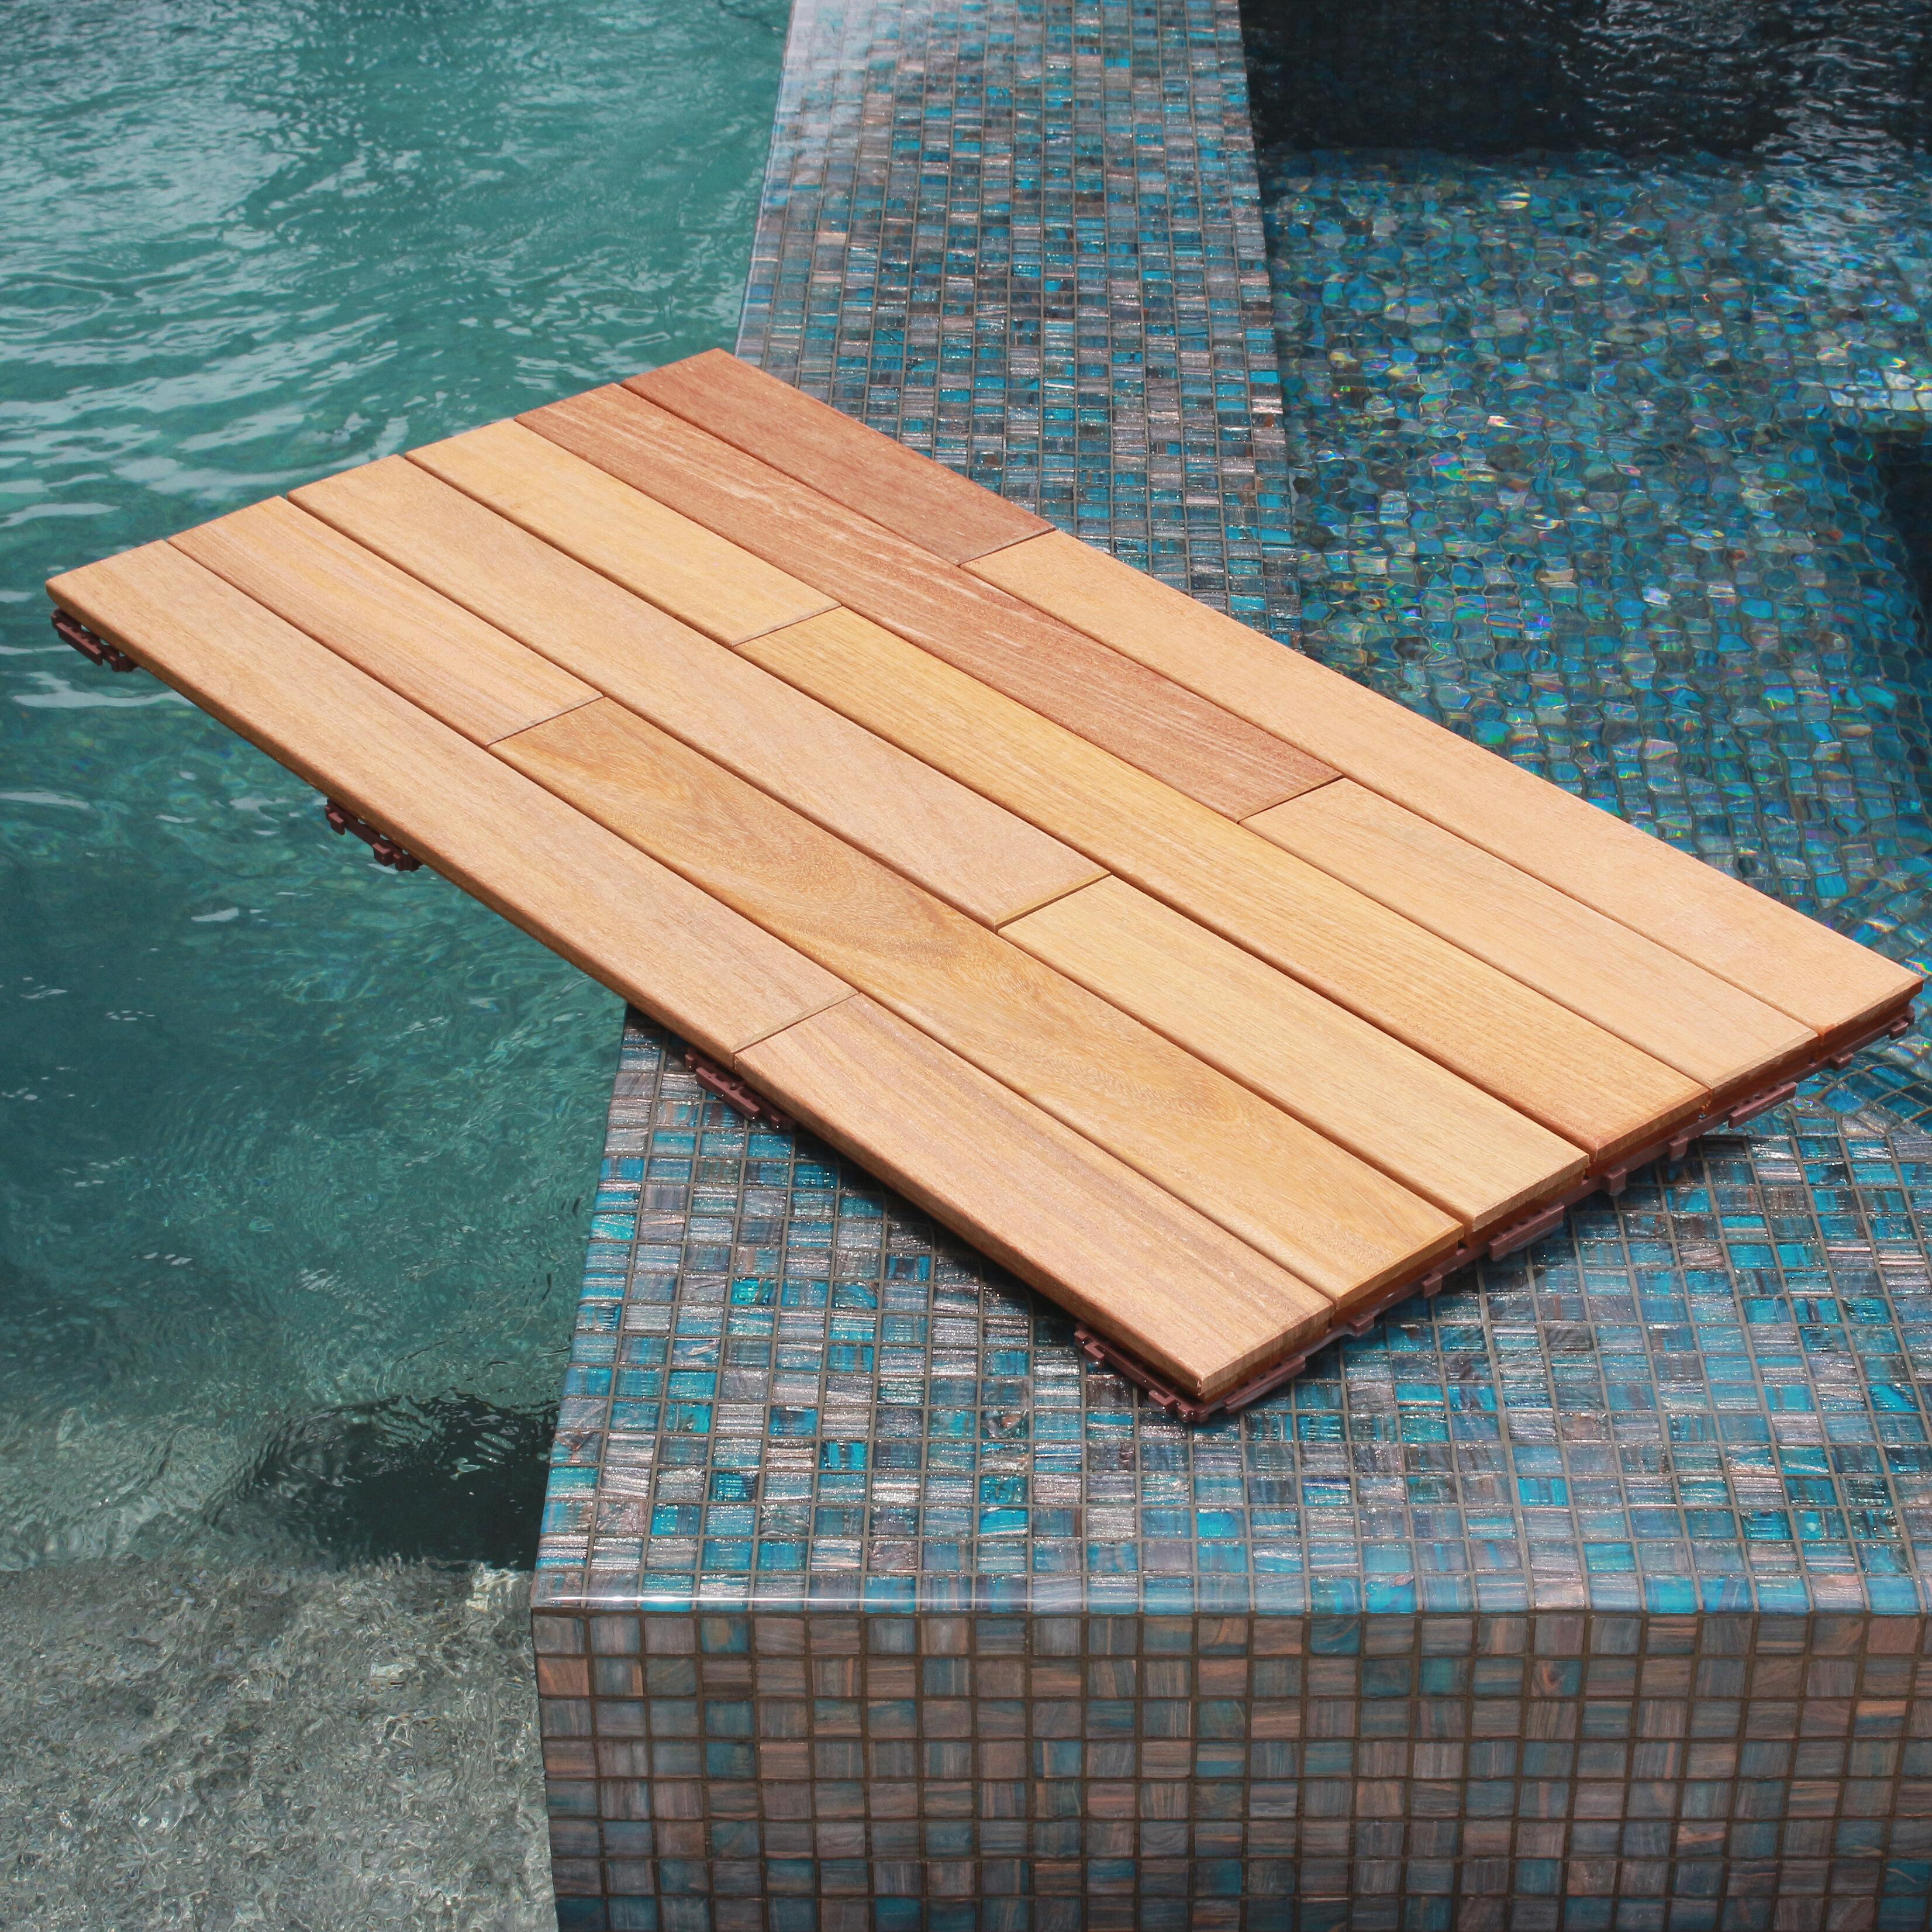 Flexdeck 36 X 18 Wood Interlocking Deck Plank In Natural Reviews Wayfair